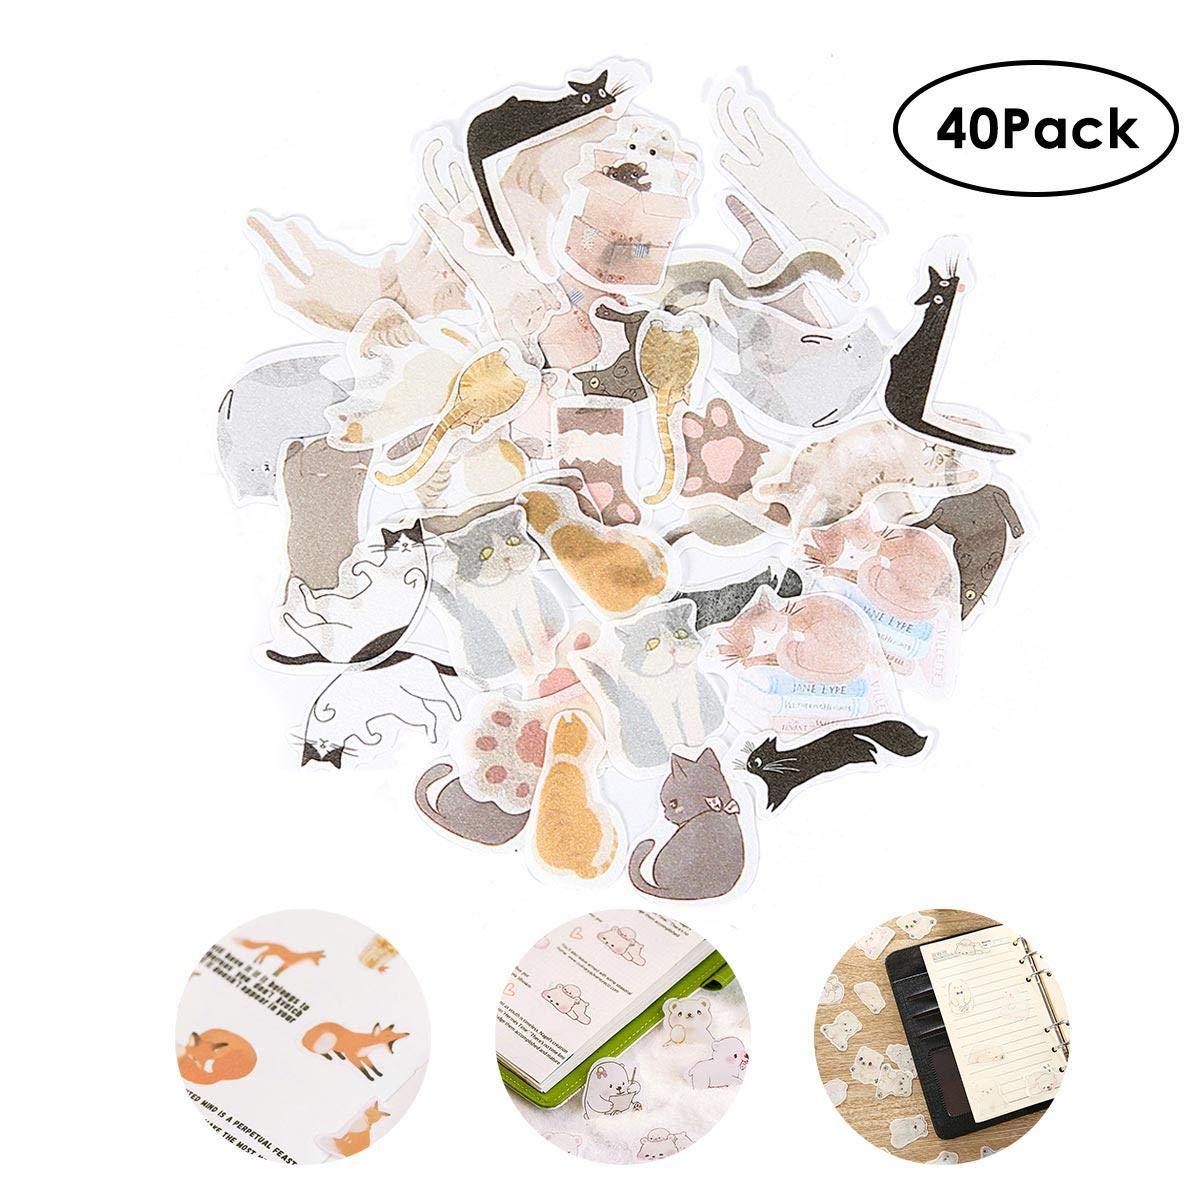 Notebook Hamkaw Ephemera Pack Card Journal Letters 40 PZ Lovely Cute Animal Note Adesivi Washi Masking Sticky Paper Bear Hamster Baby Cat Coniglio Fox Penguin Piggy Doggy per Scrapbook